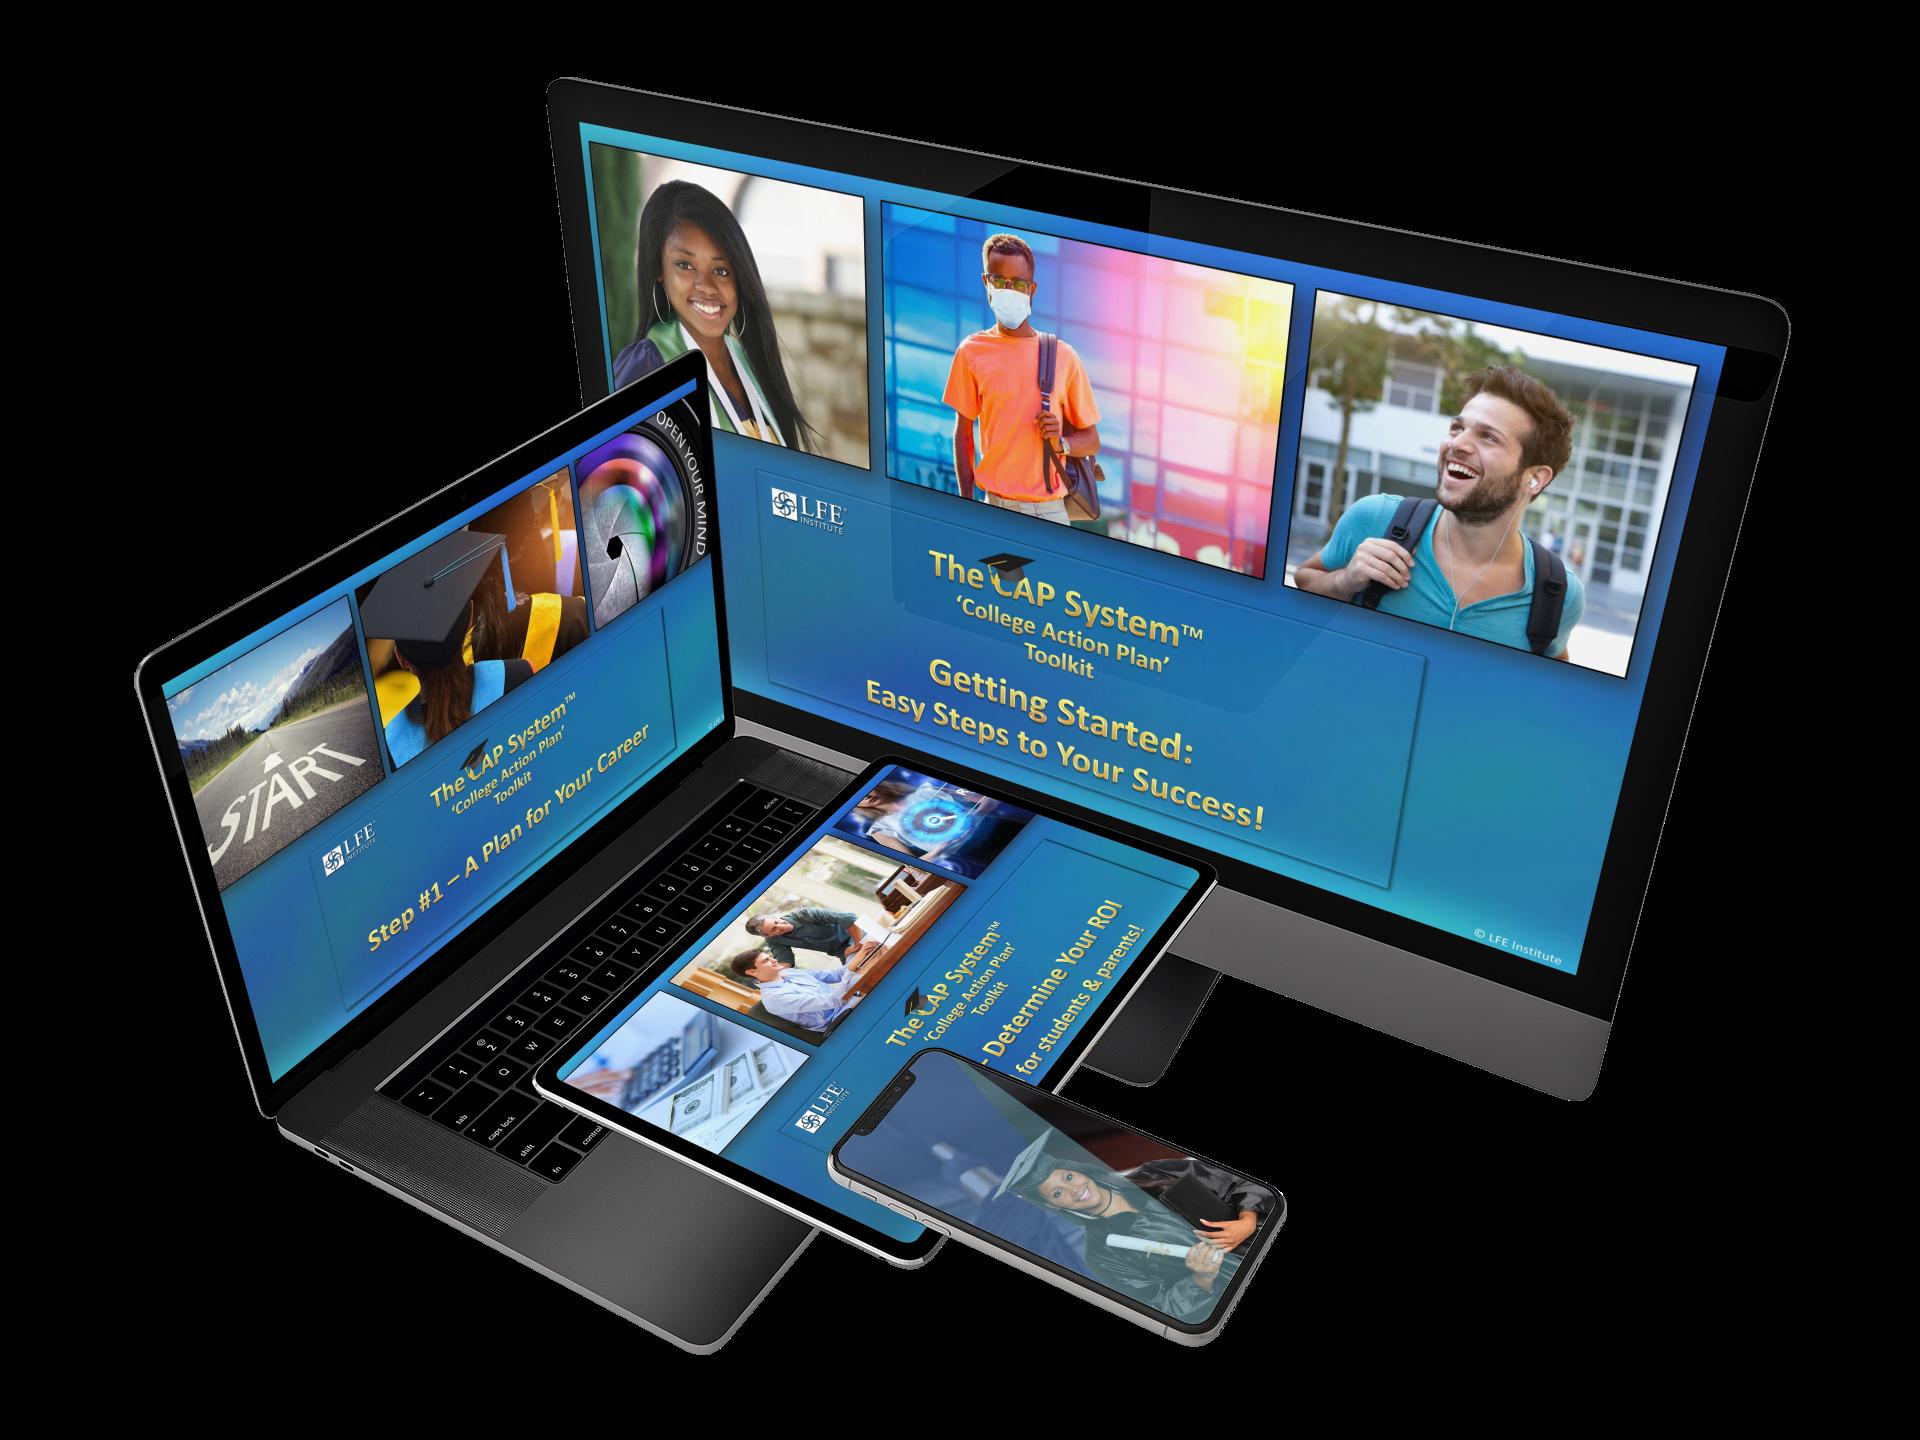 digital-mockup-of-four-different-apple-devices-2025-el1